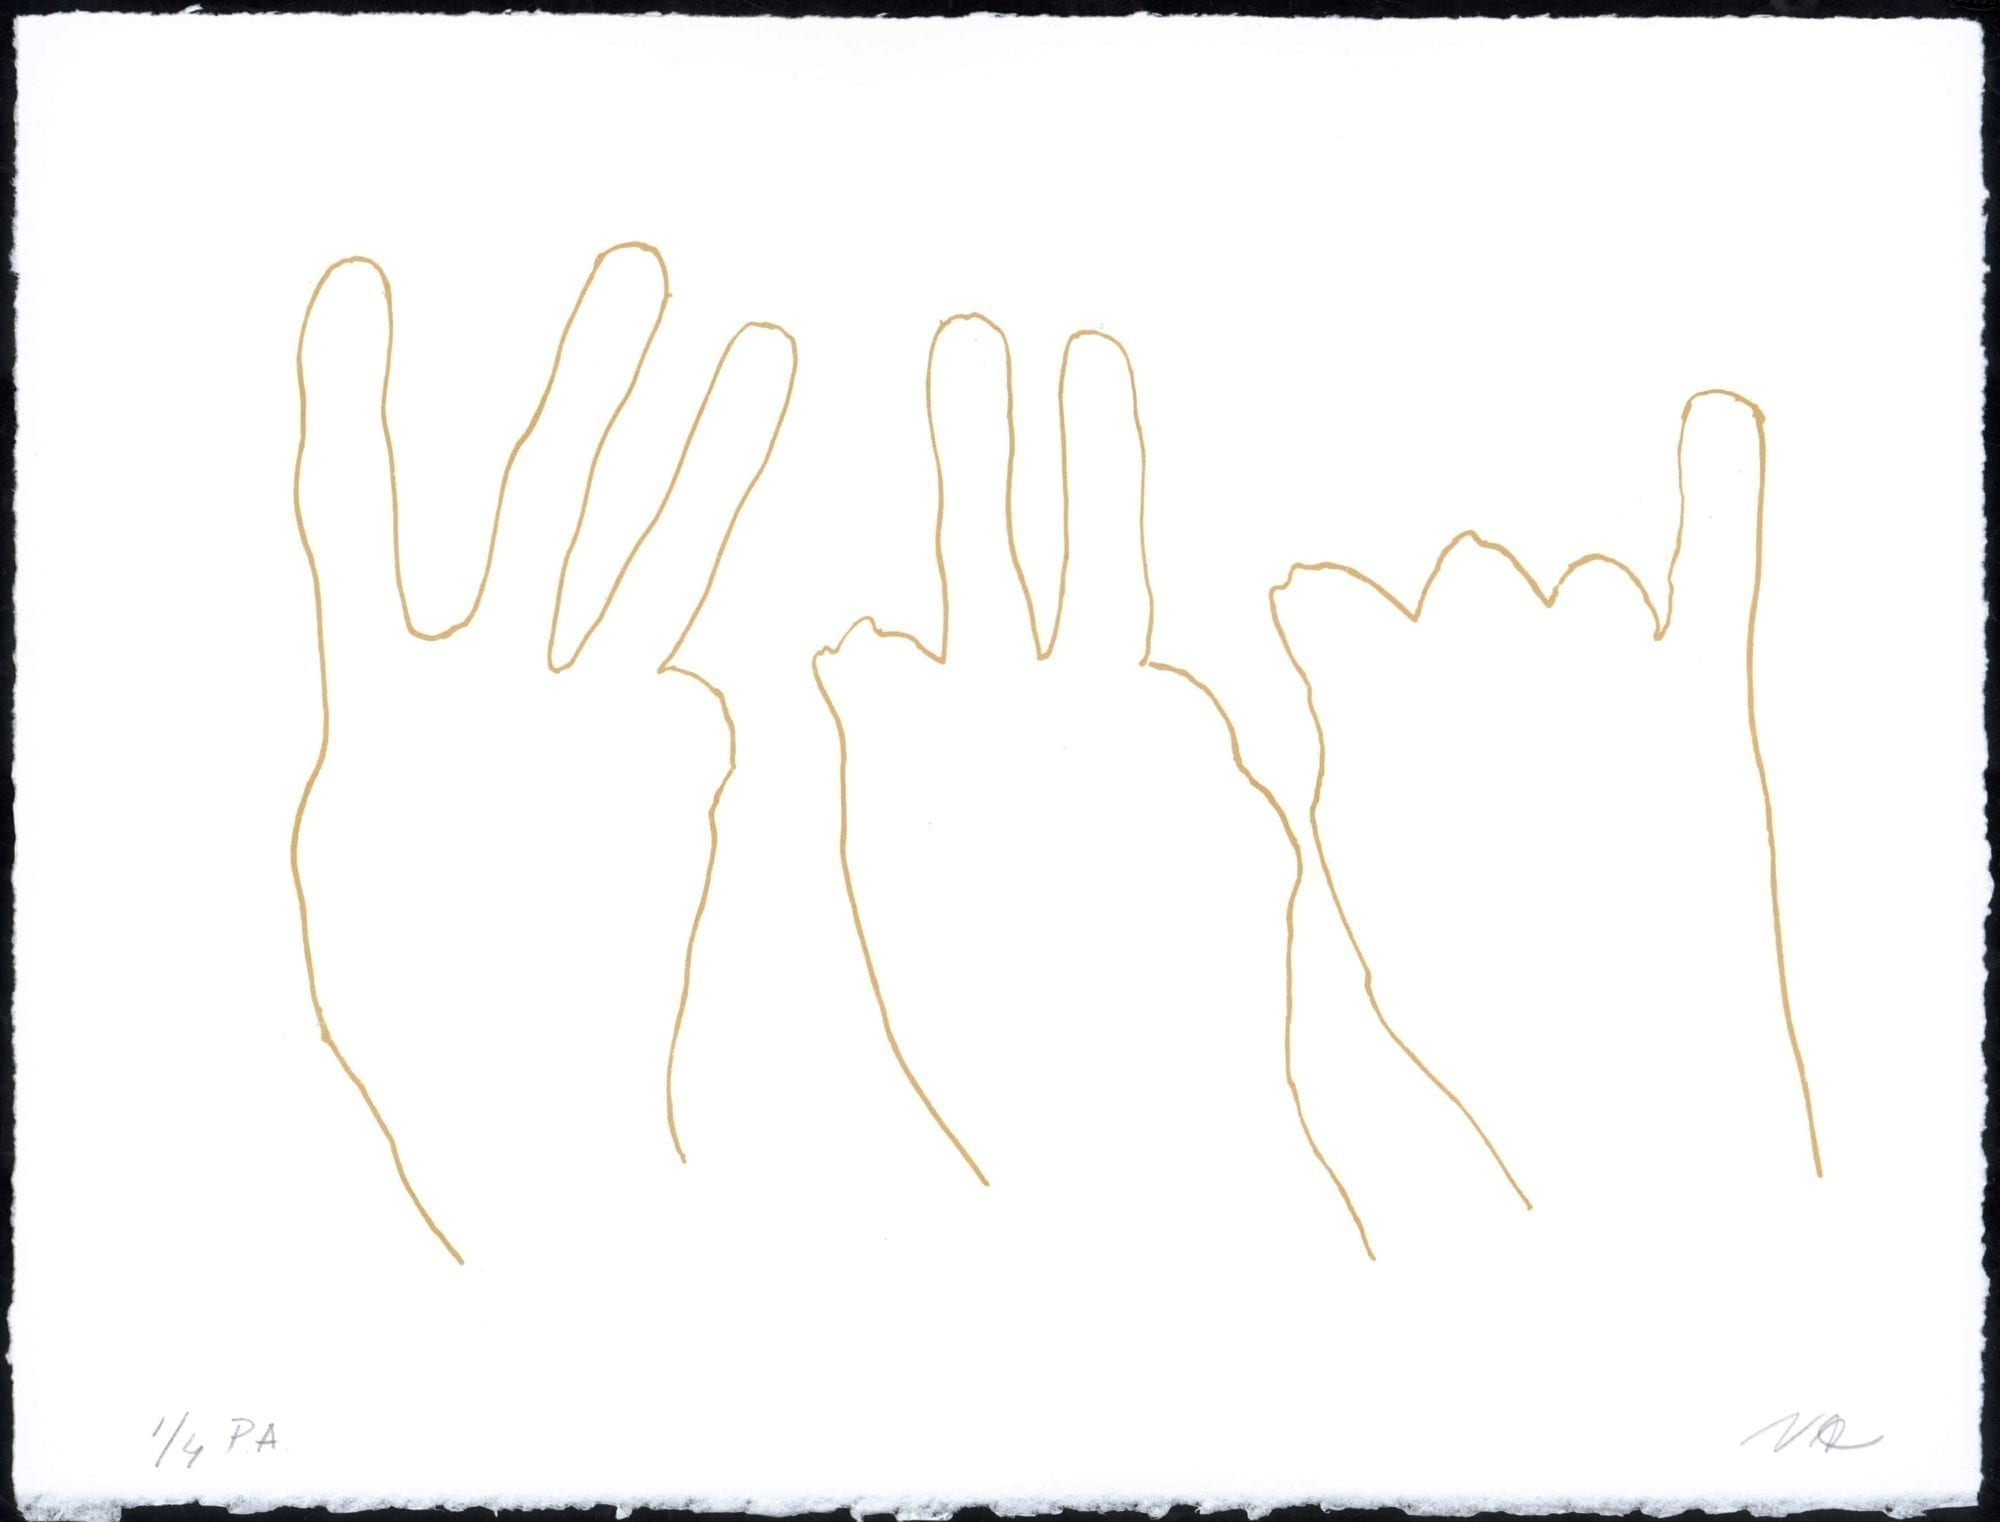 Susana Solano, Alrededor de una mano I, 2006